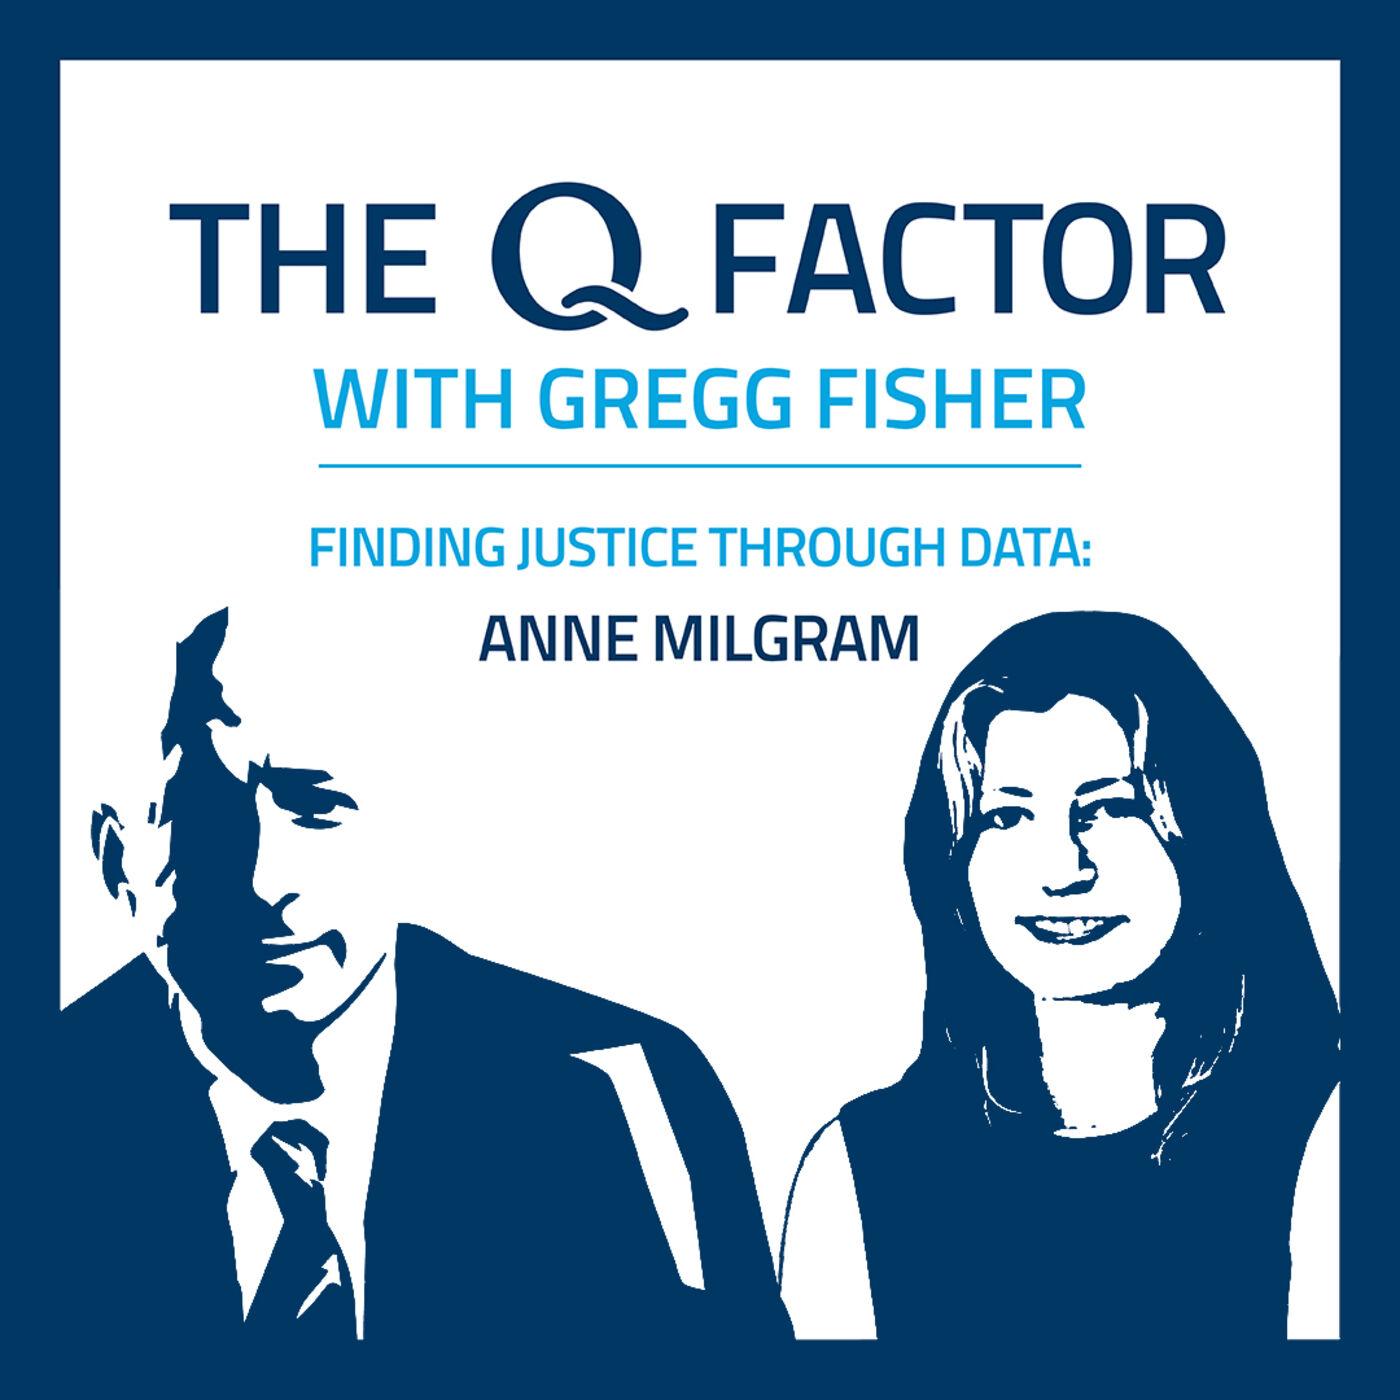 Anne Milgram: Finding Justice Through Data